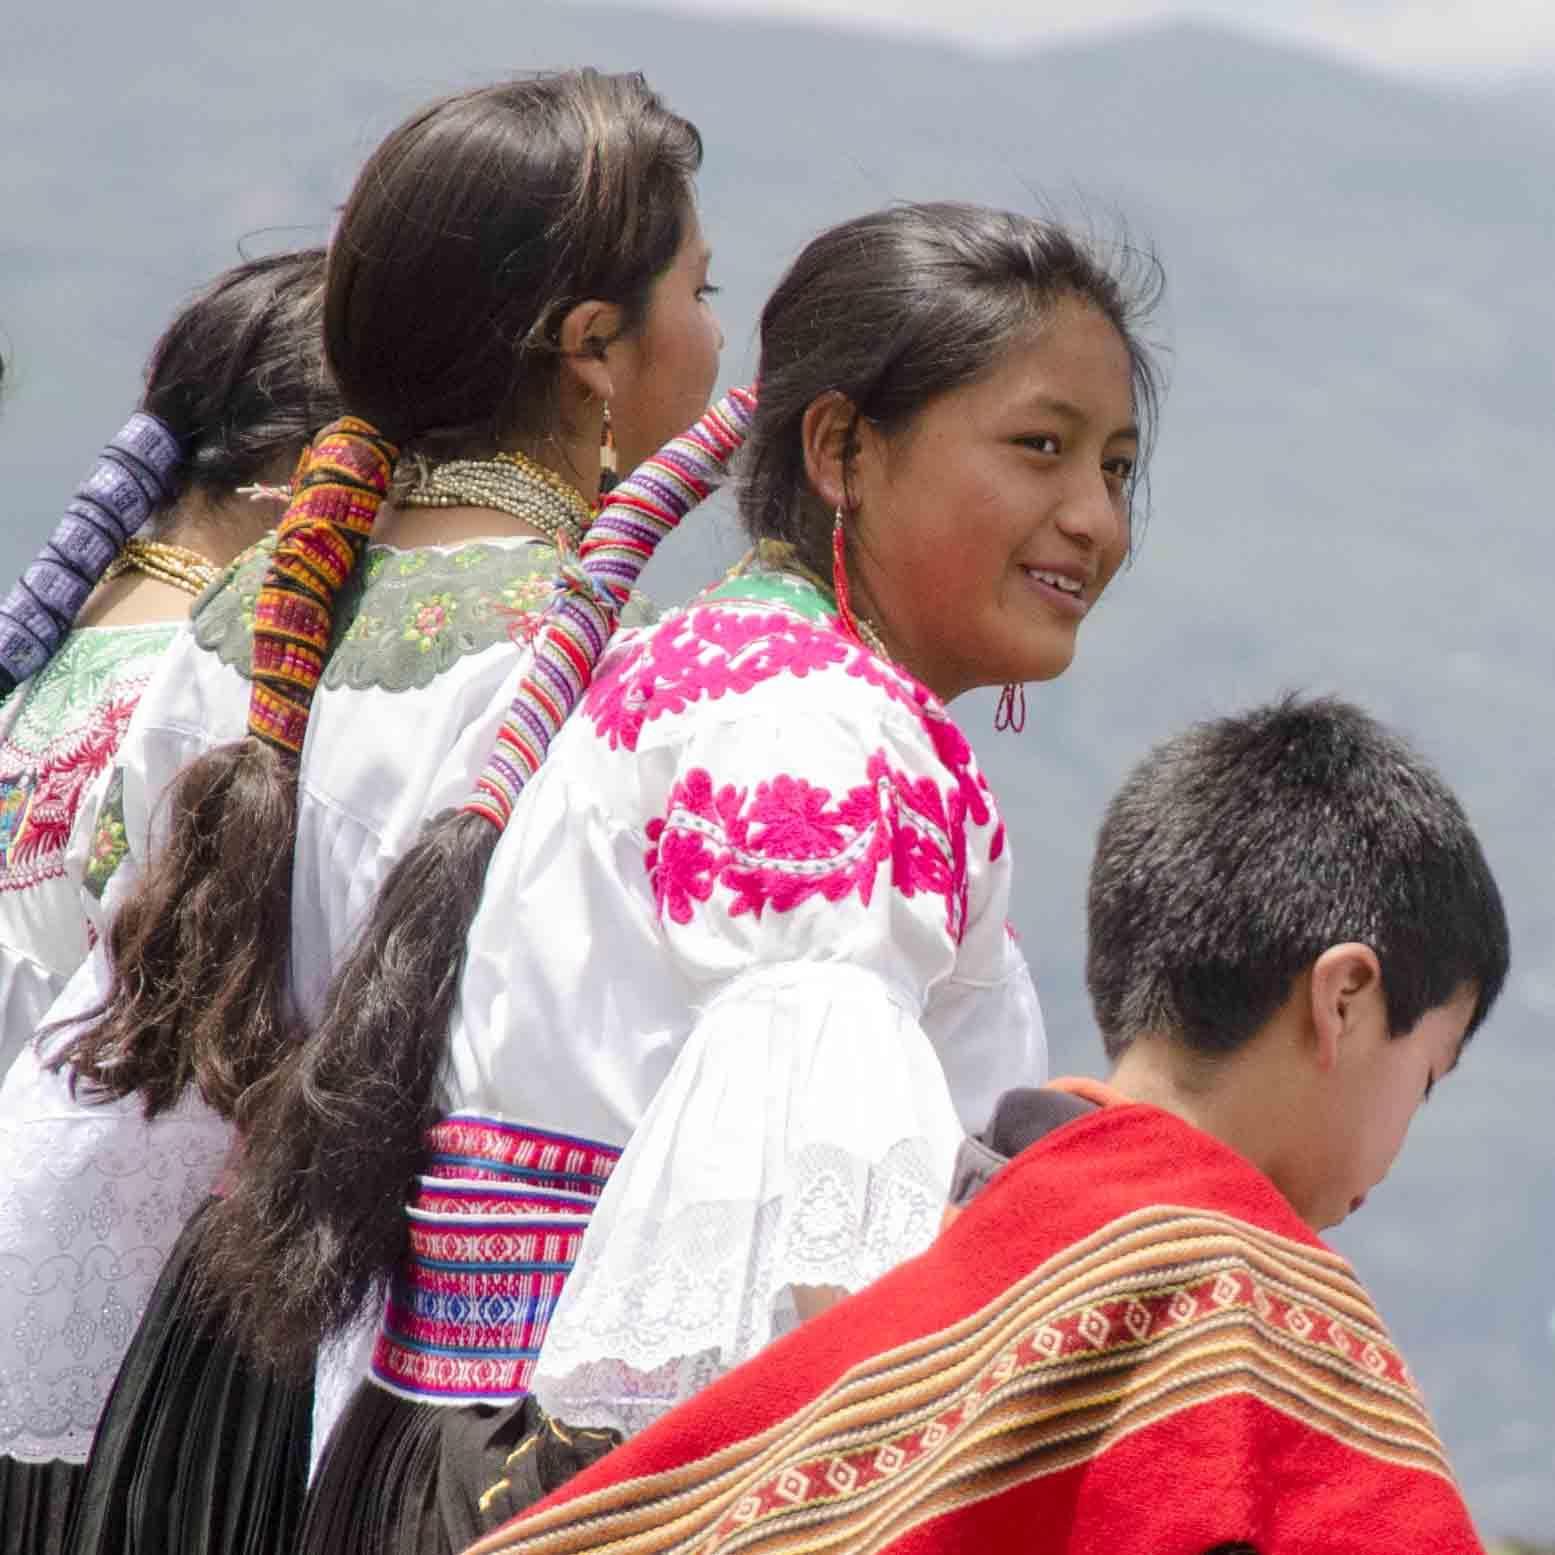 Dancers at Cochasqui, Ecuador | ©Angela Drake